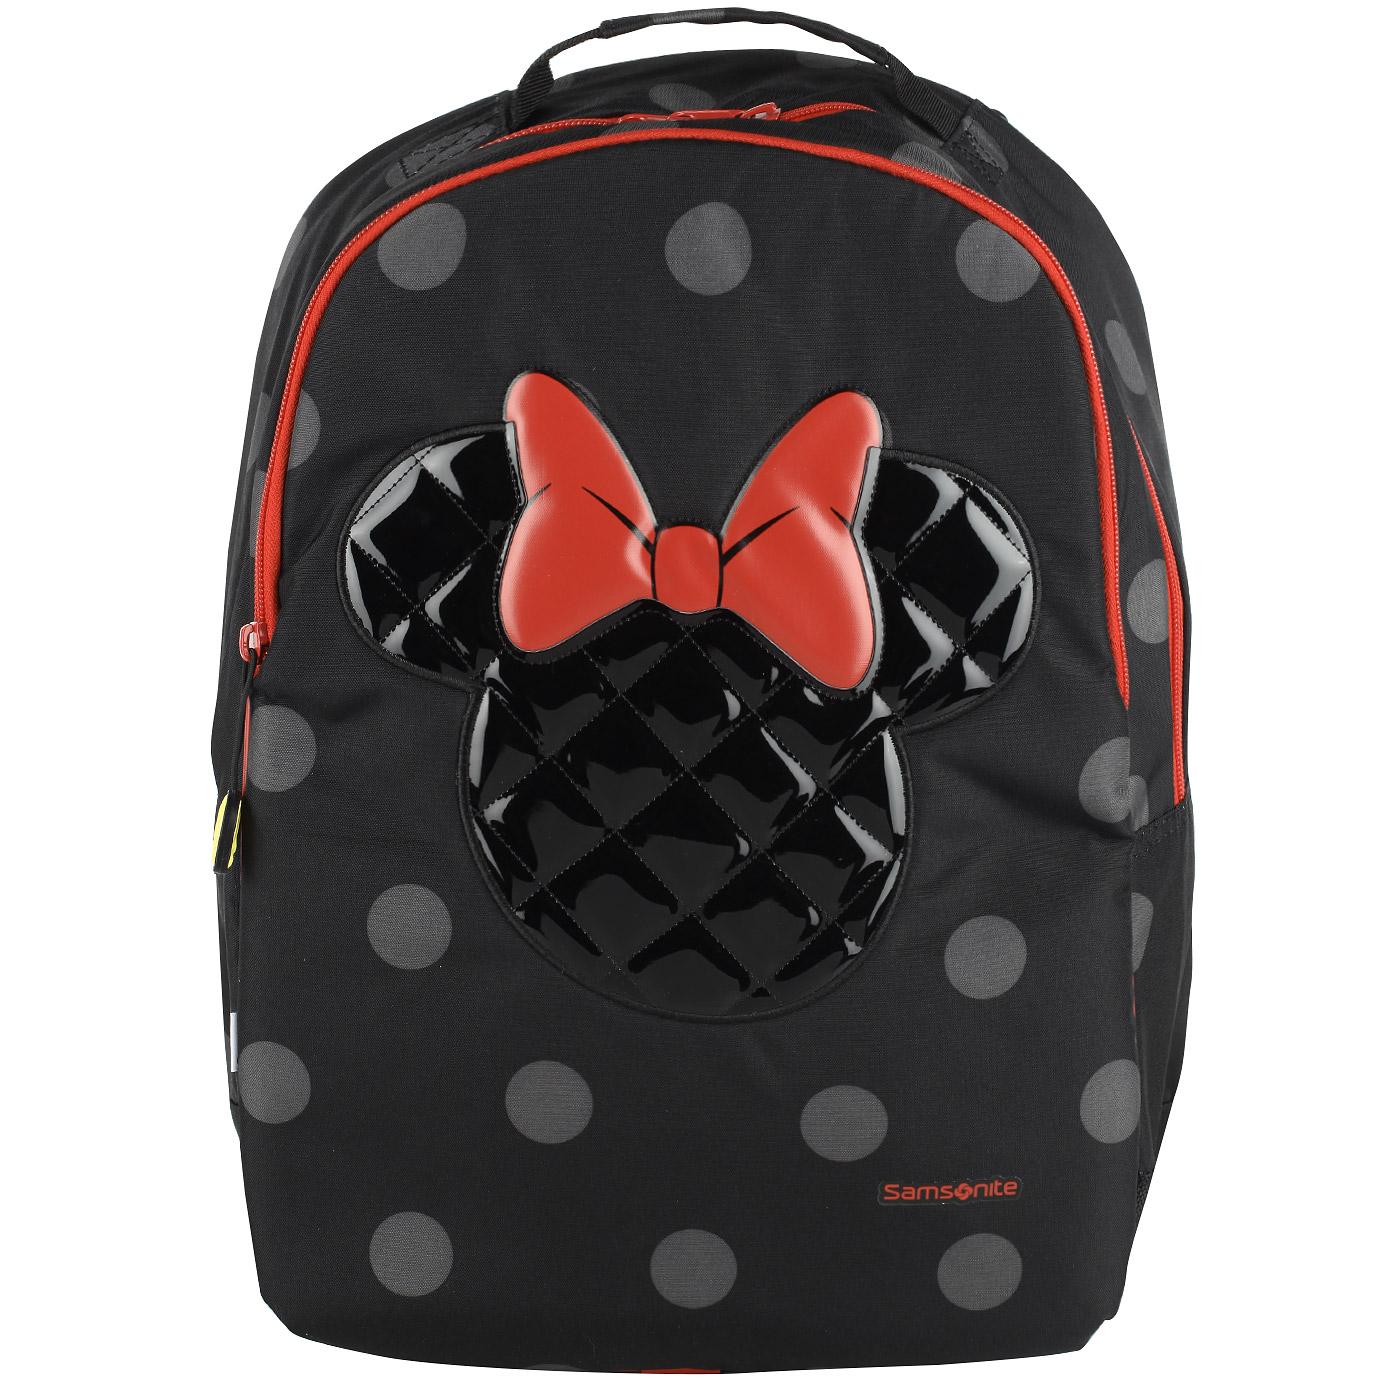 Детский рюкзак Samsonite Disney Ultimate 23C29006 - 2000557551732 ... 52bdc0b7c24